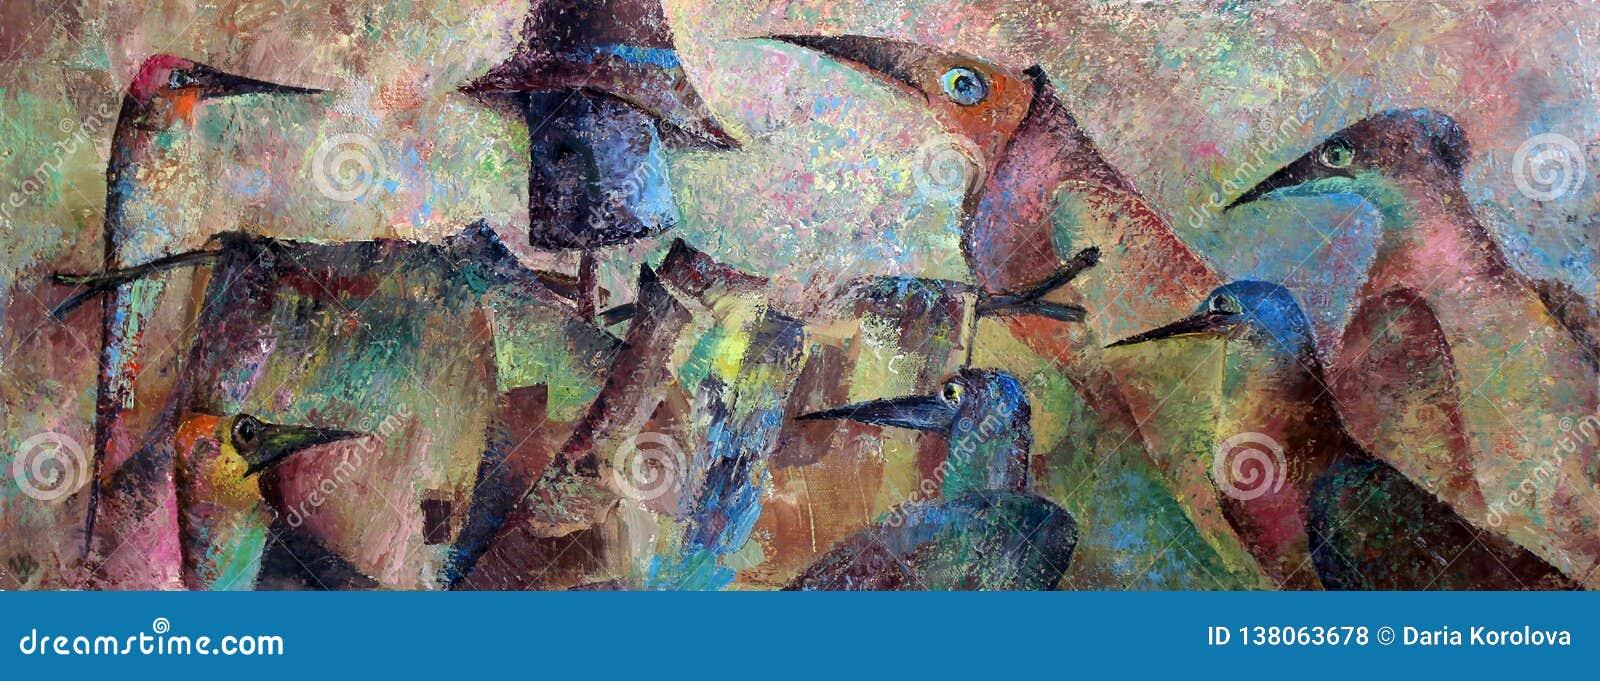 Fotografikölgemälde auf Segeltuch vögel